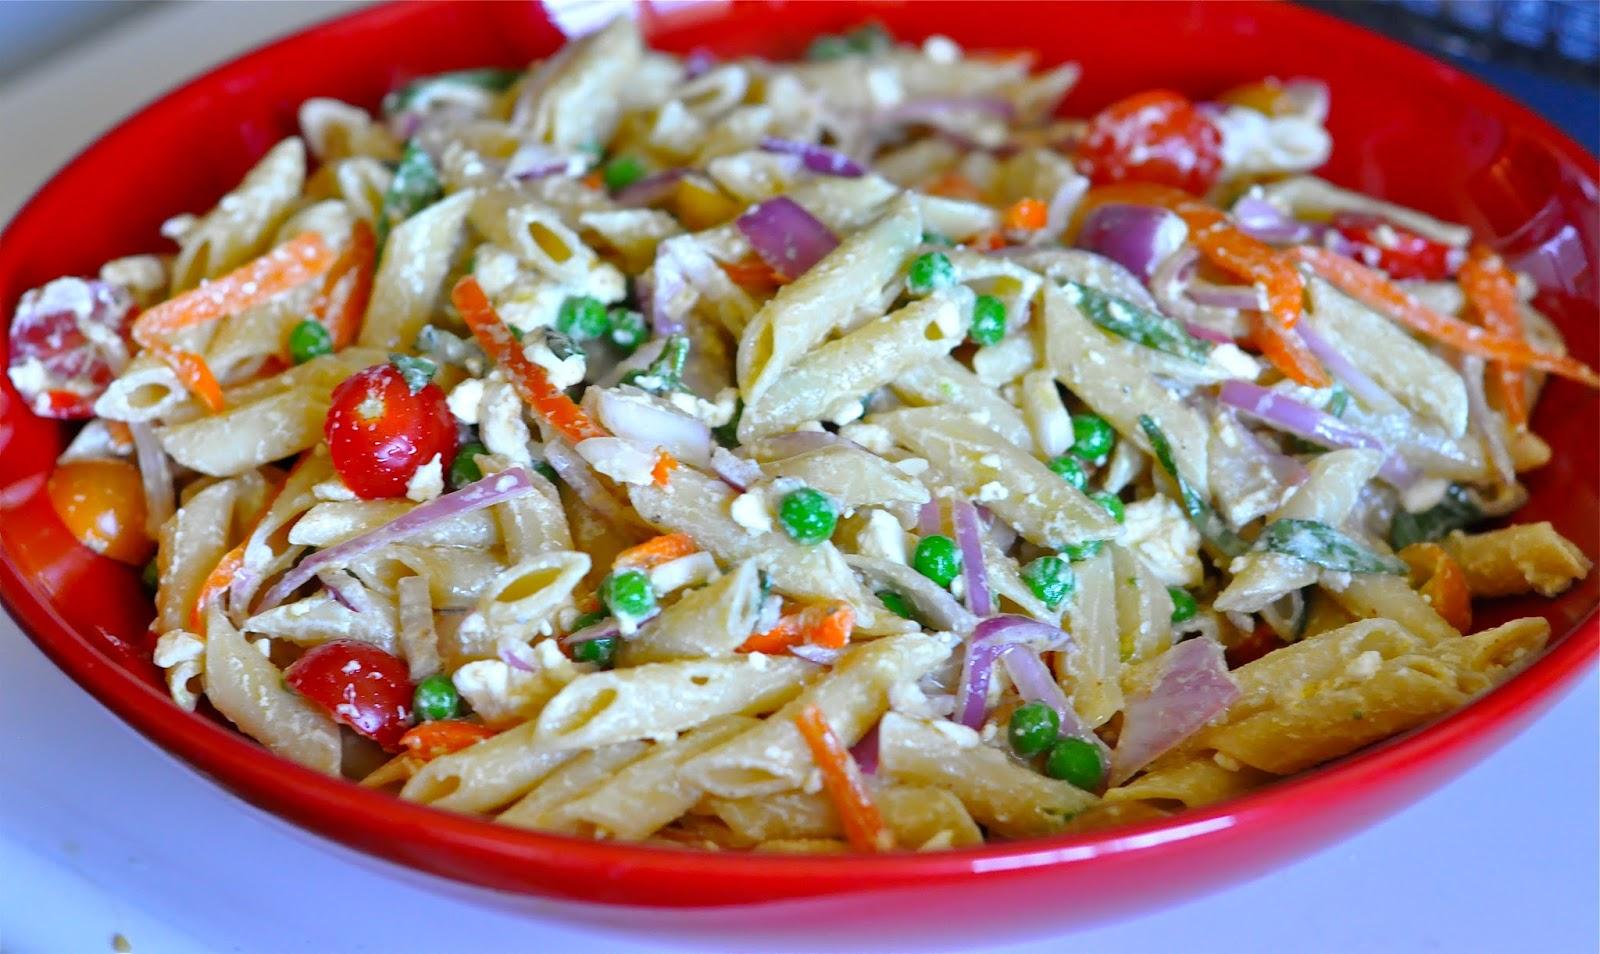 Ashley's Cooking Adventures: Mediterranean Pasta Salad